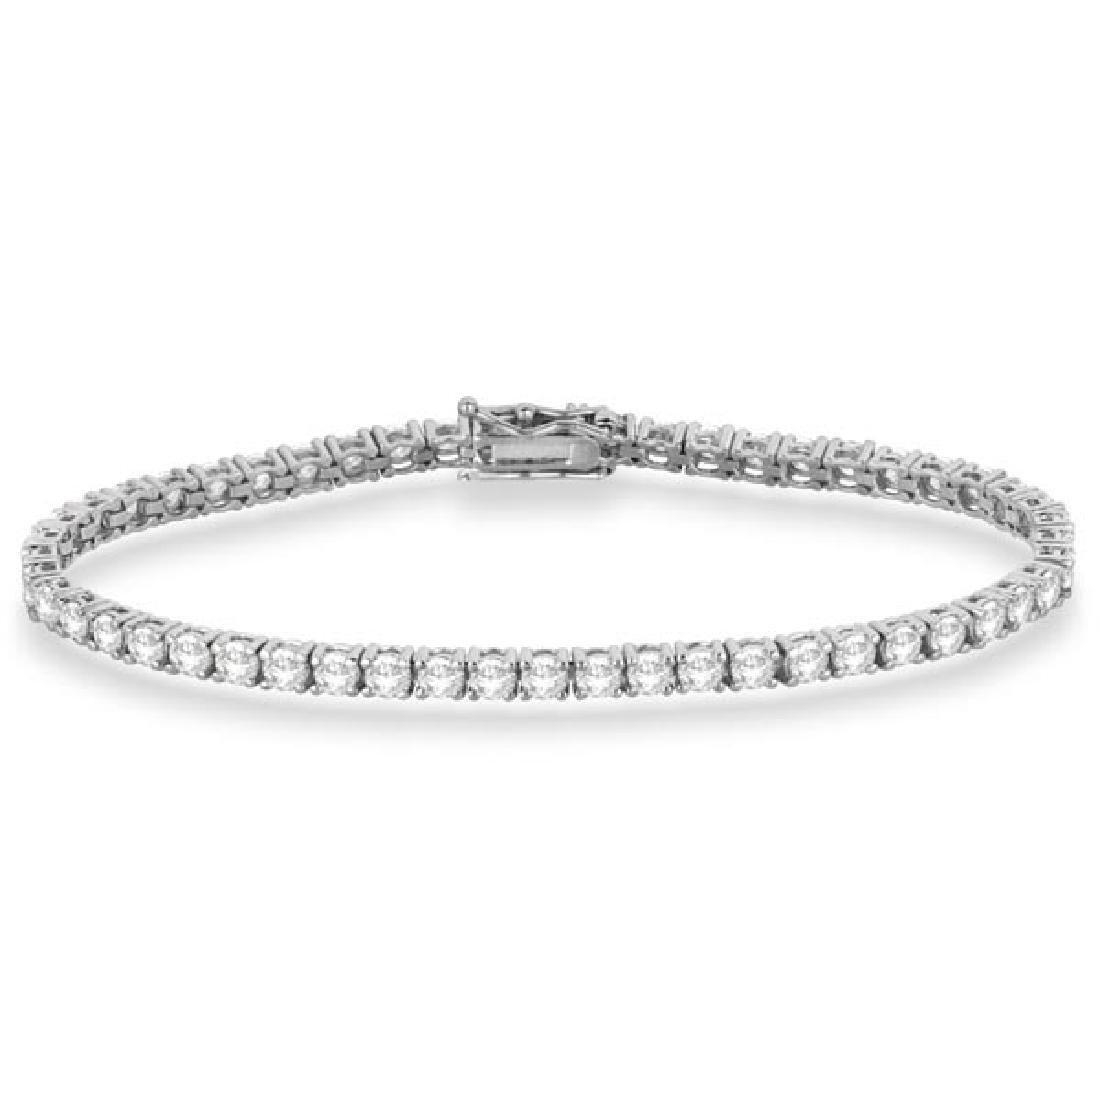 Eternity Diamond Tennis Bracelet 14k White Gold (4.13ct